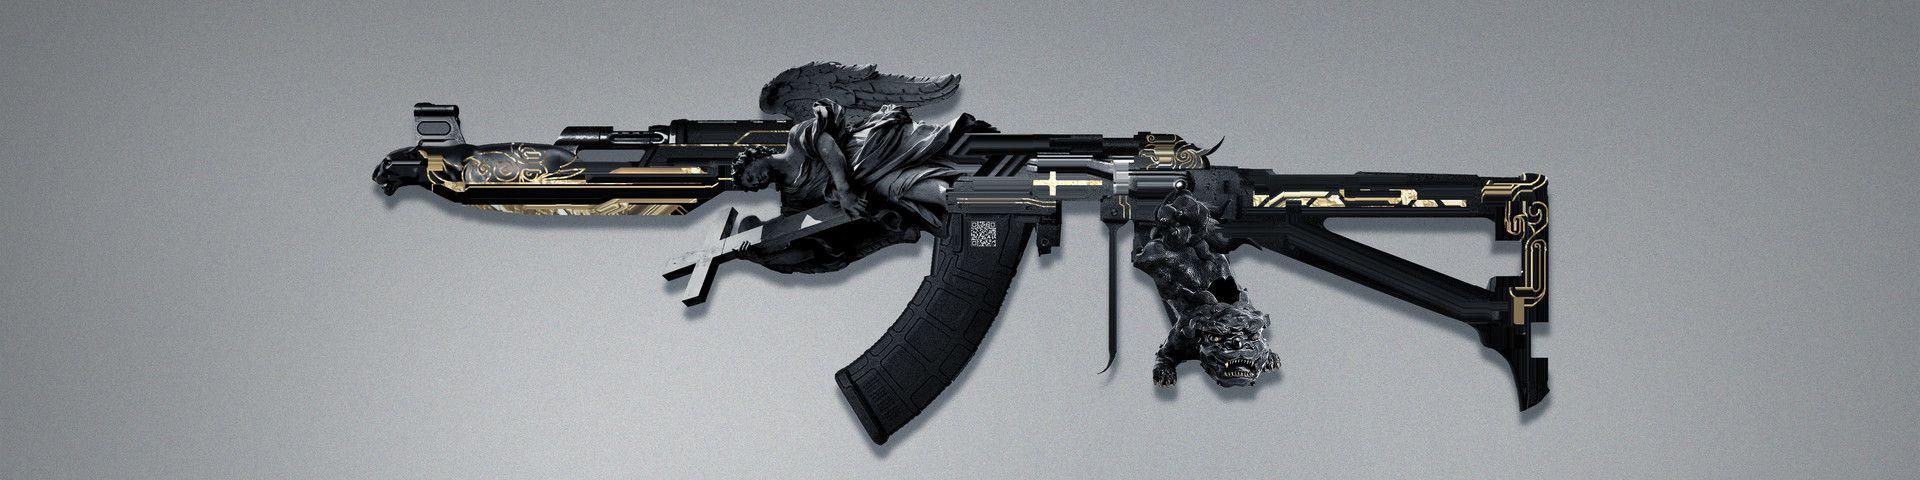 4Pcs//Sets Military Weapon Gatling M2 Aviation Machine Guns MK19 WW2 World War